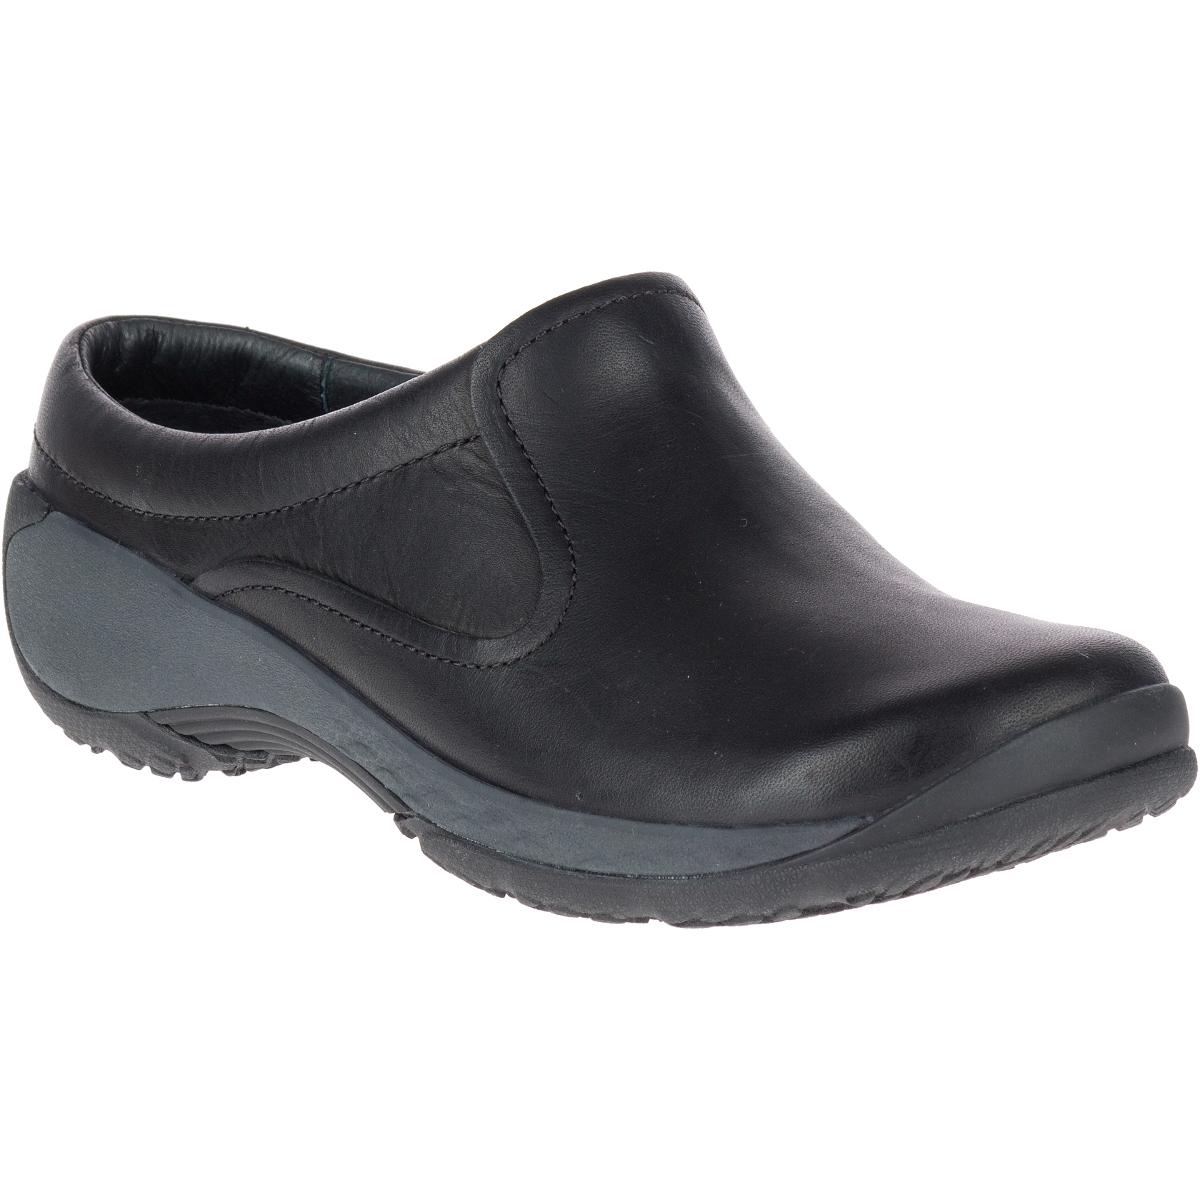 Merrell Women's Encore Q2 Slide Leather Shoes - Black, 10